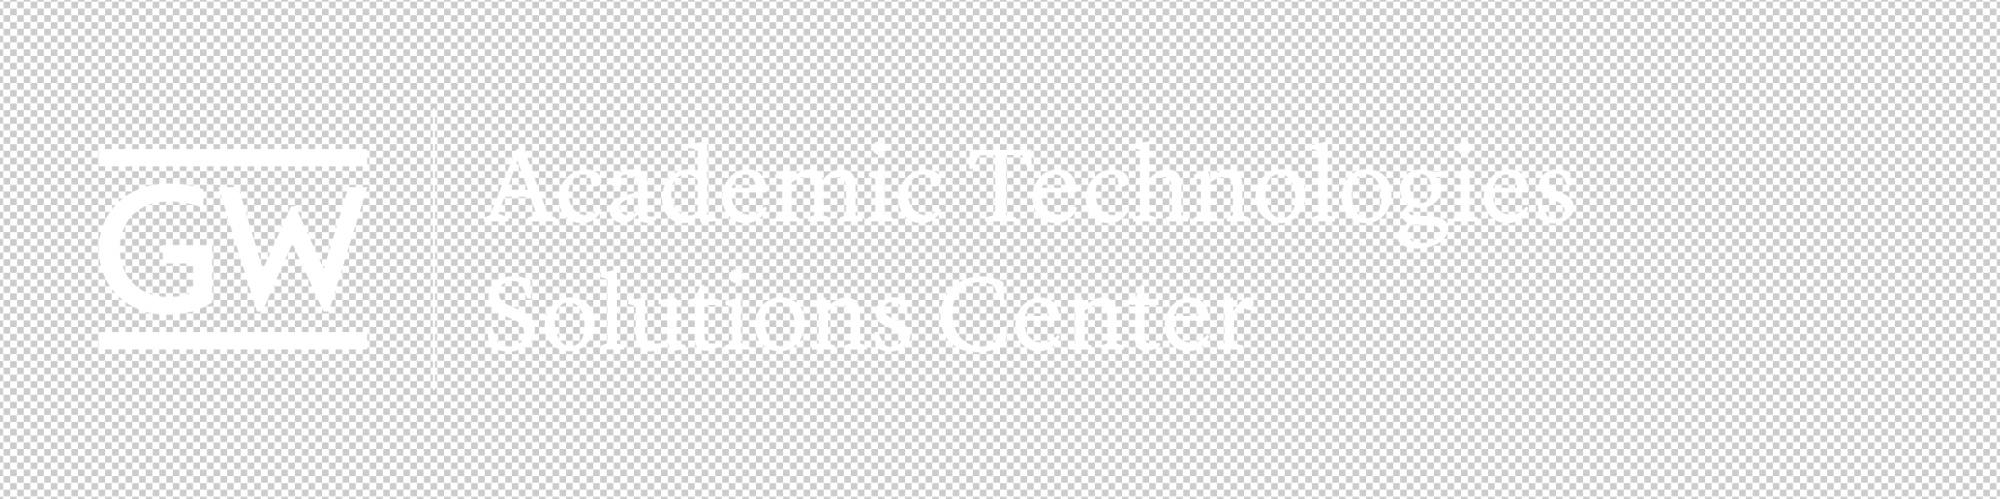 AT Solutions Center logo white